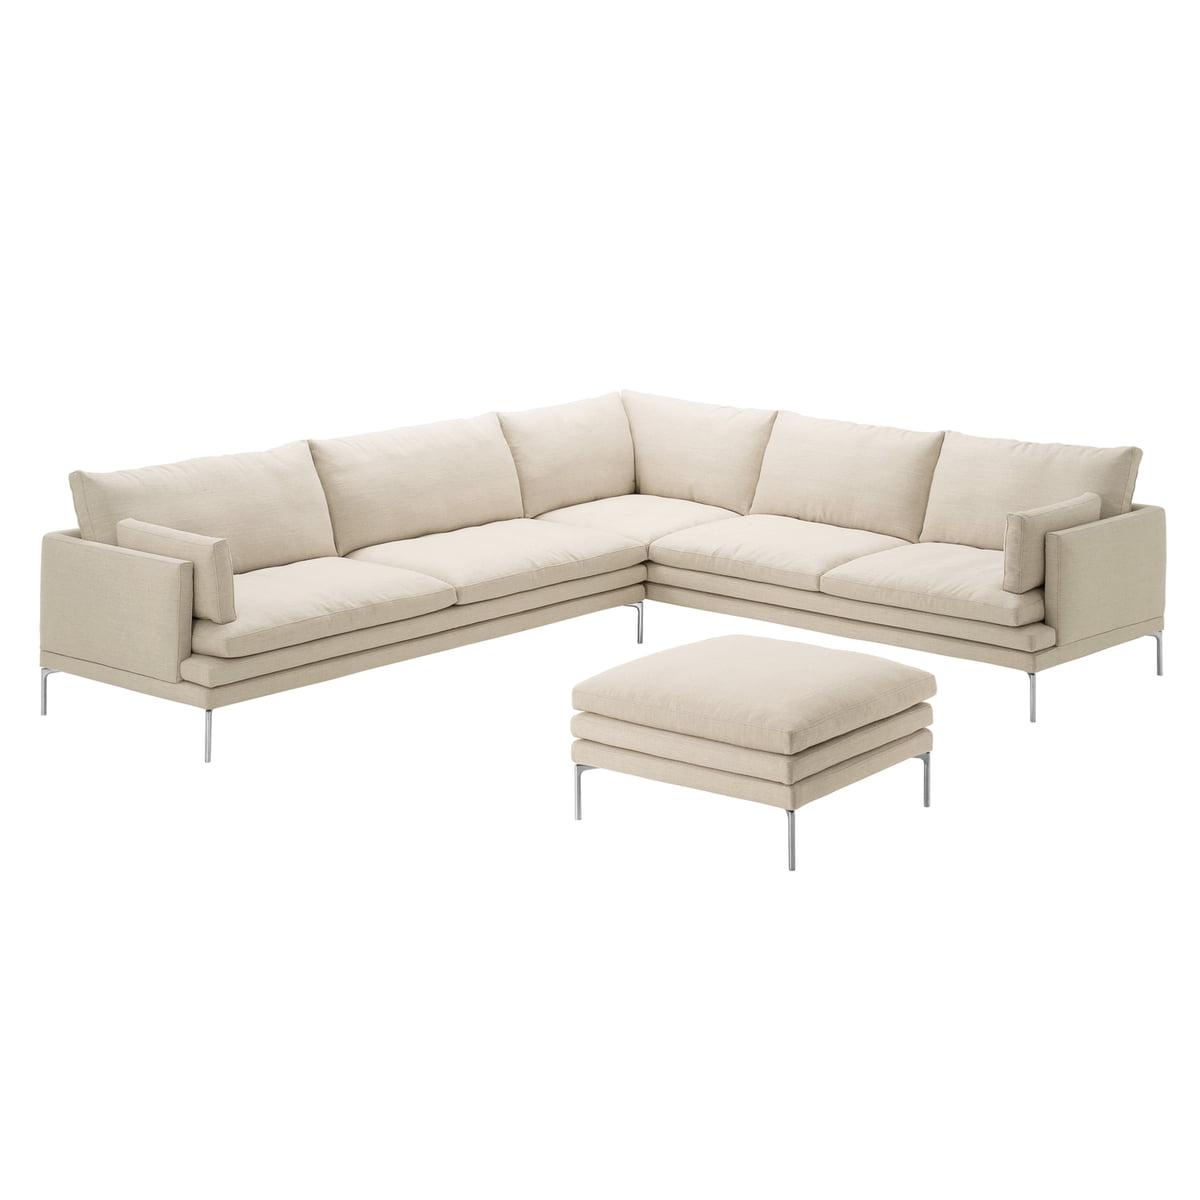 zanotta sofa william jetzt kaufen connox. Black Bedroom Furniture Sets. Home Design Ideas